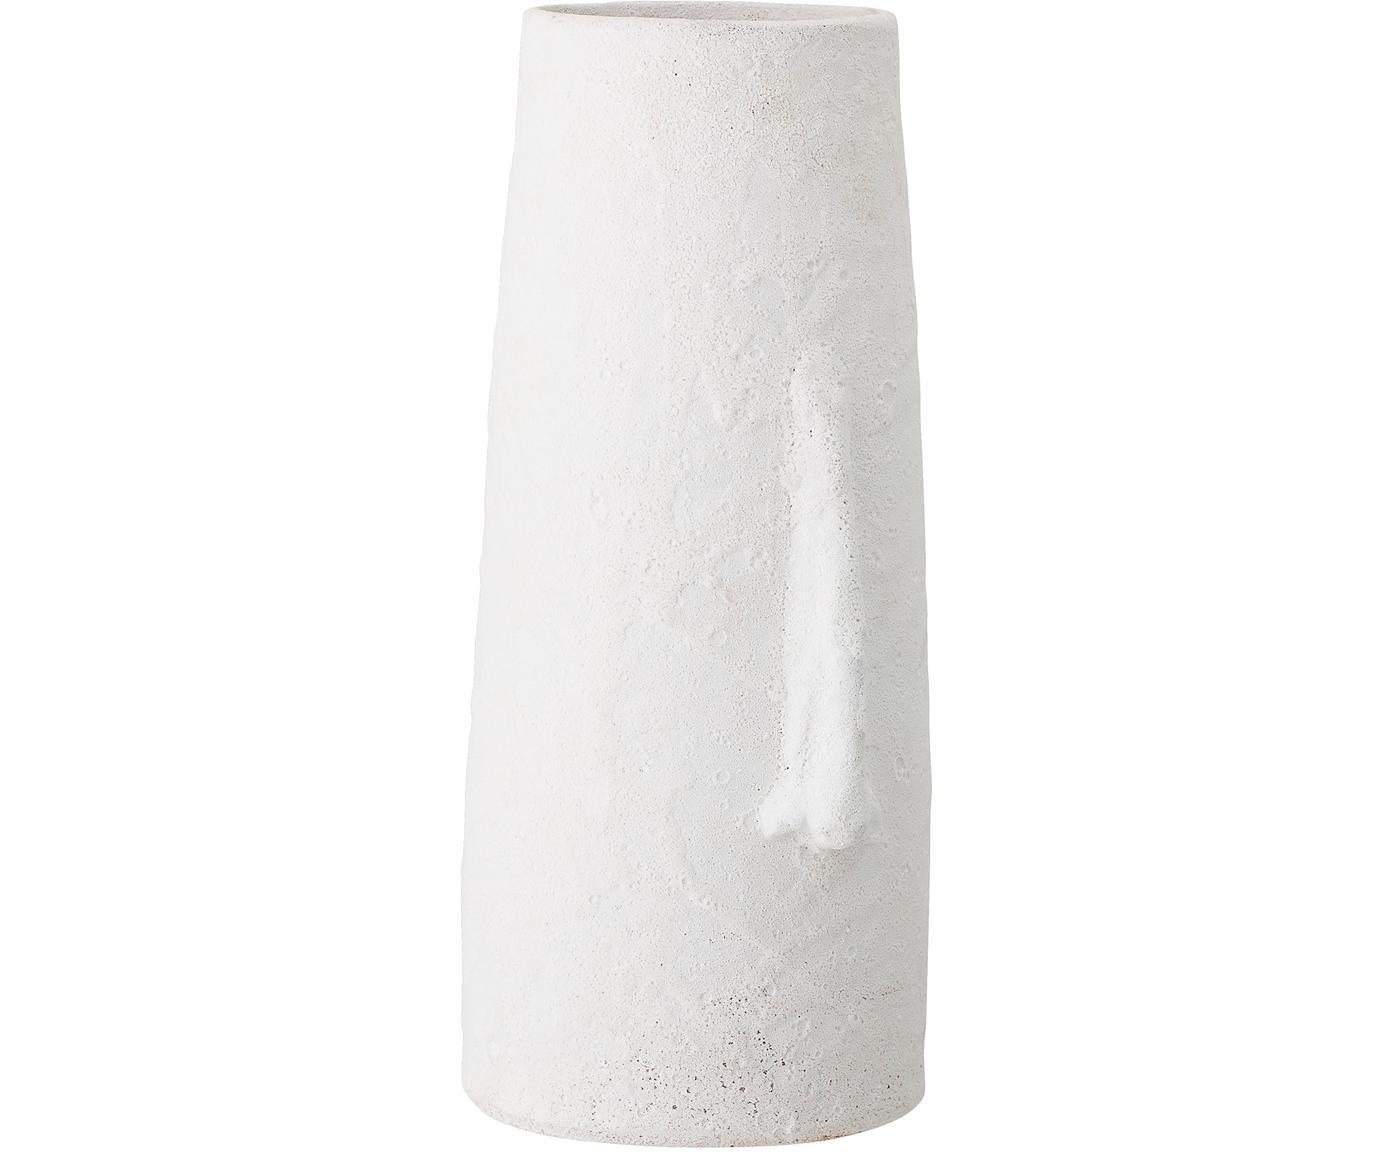 Vaso decorativo in terracotta Nose, Terracotta, Bianco, Larg. 20 x Alt. 40 cm